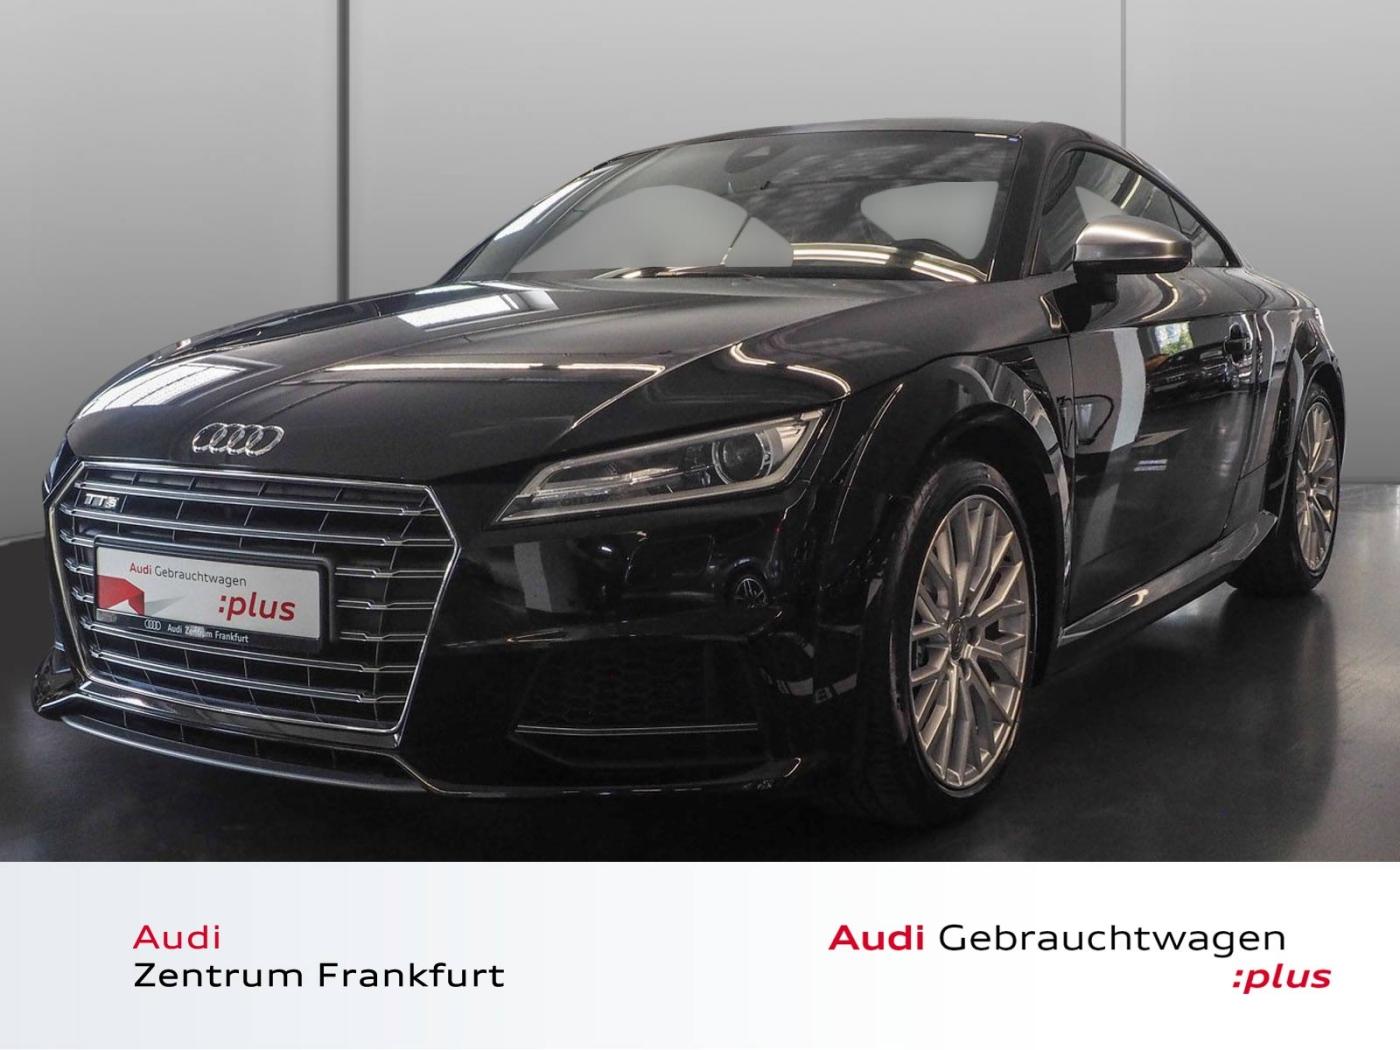 Audi TTS Coupé 2.0 TFSI quattro S tronic Navi Xenon S, Jahr 2016, Benzin